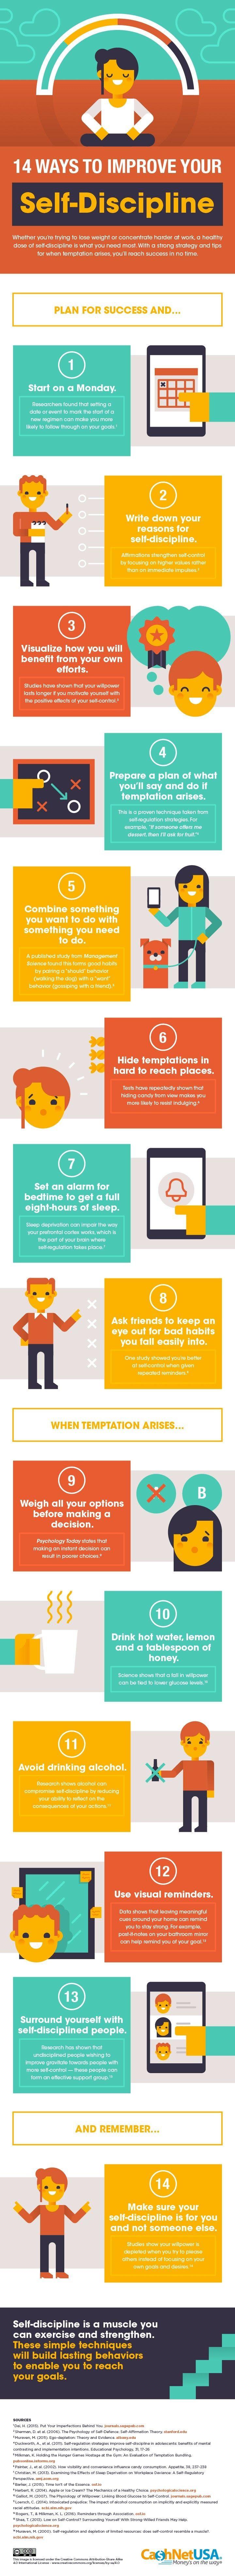 14 Ways to Improve Your Self-Discipline - #Infographic